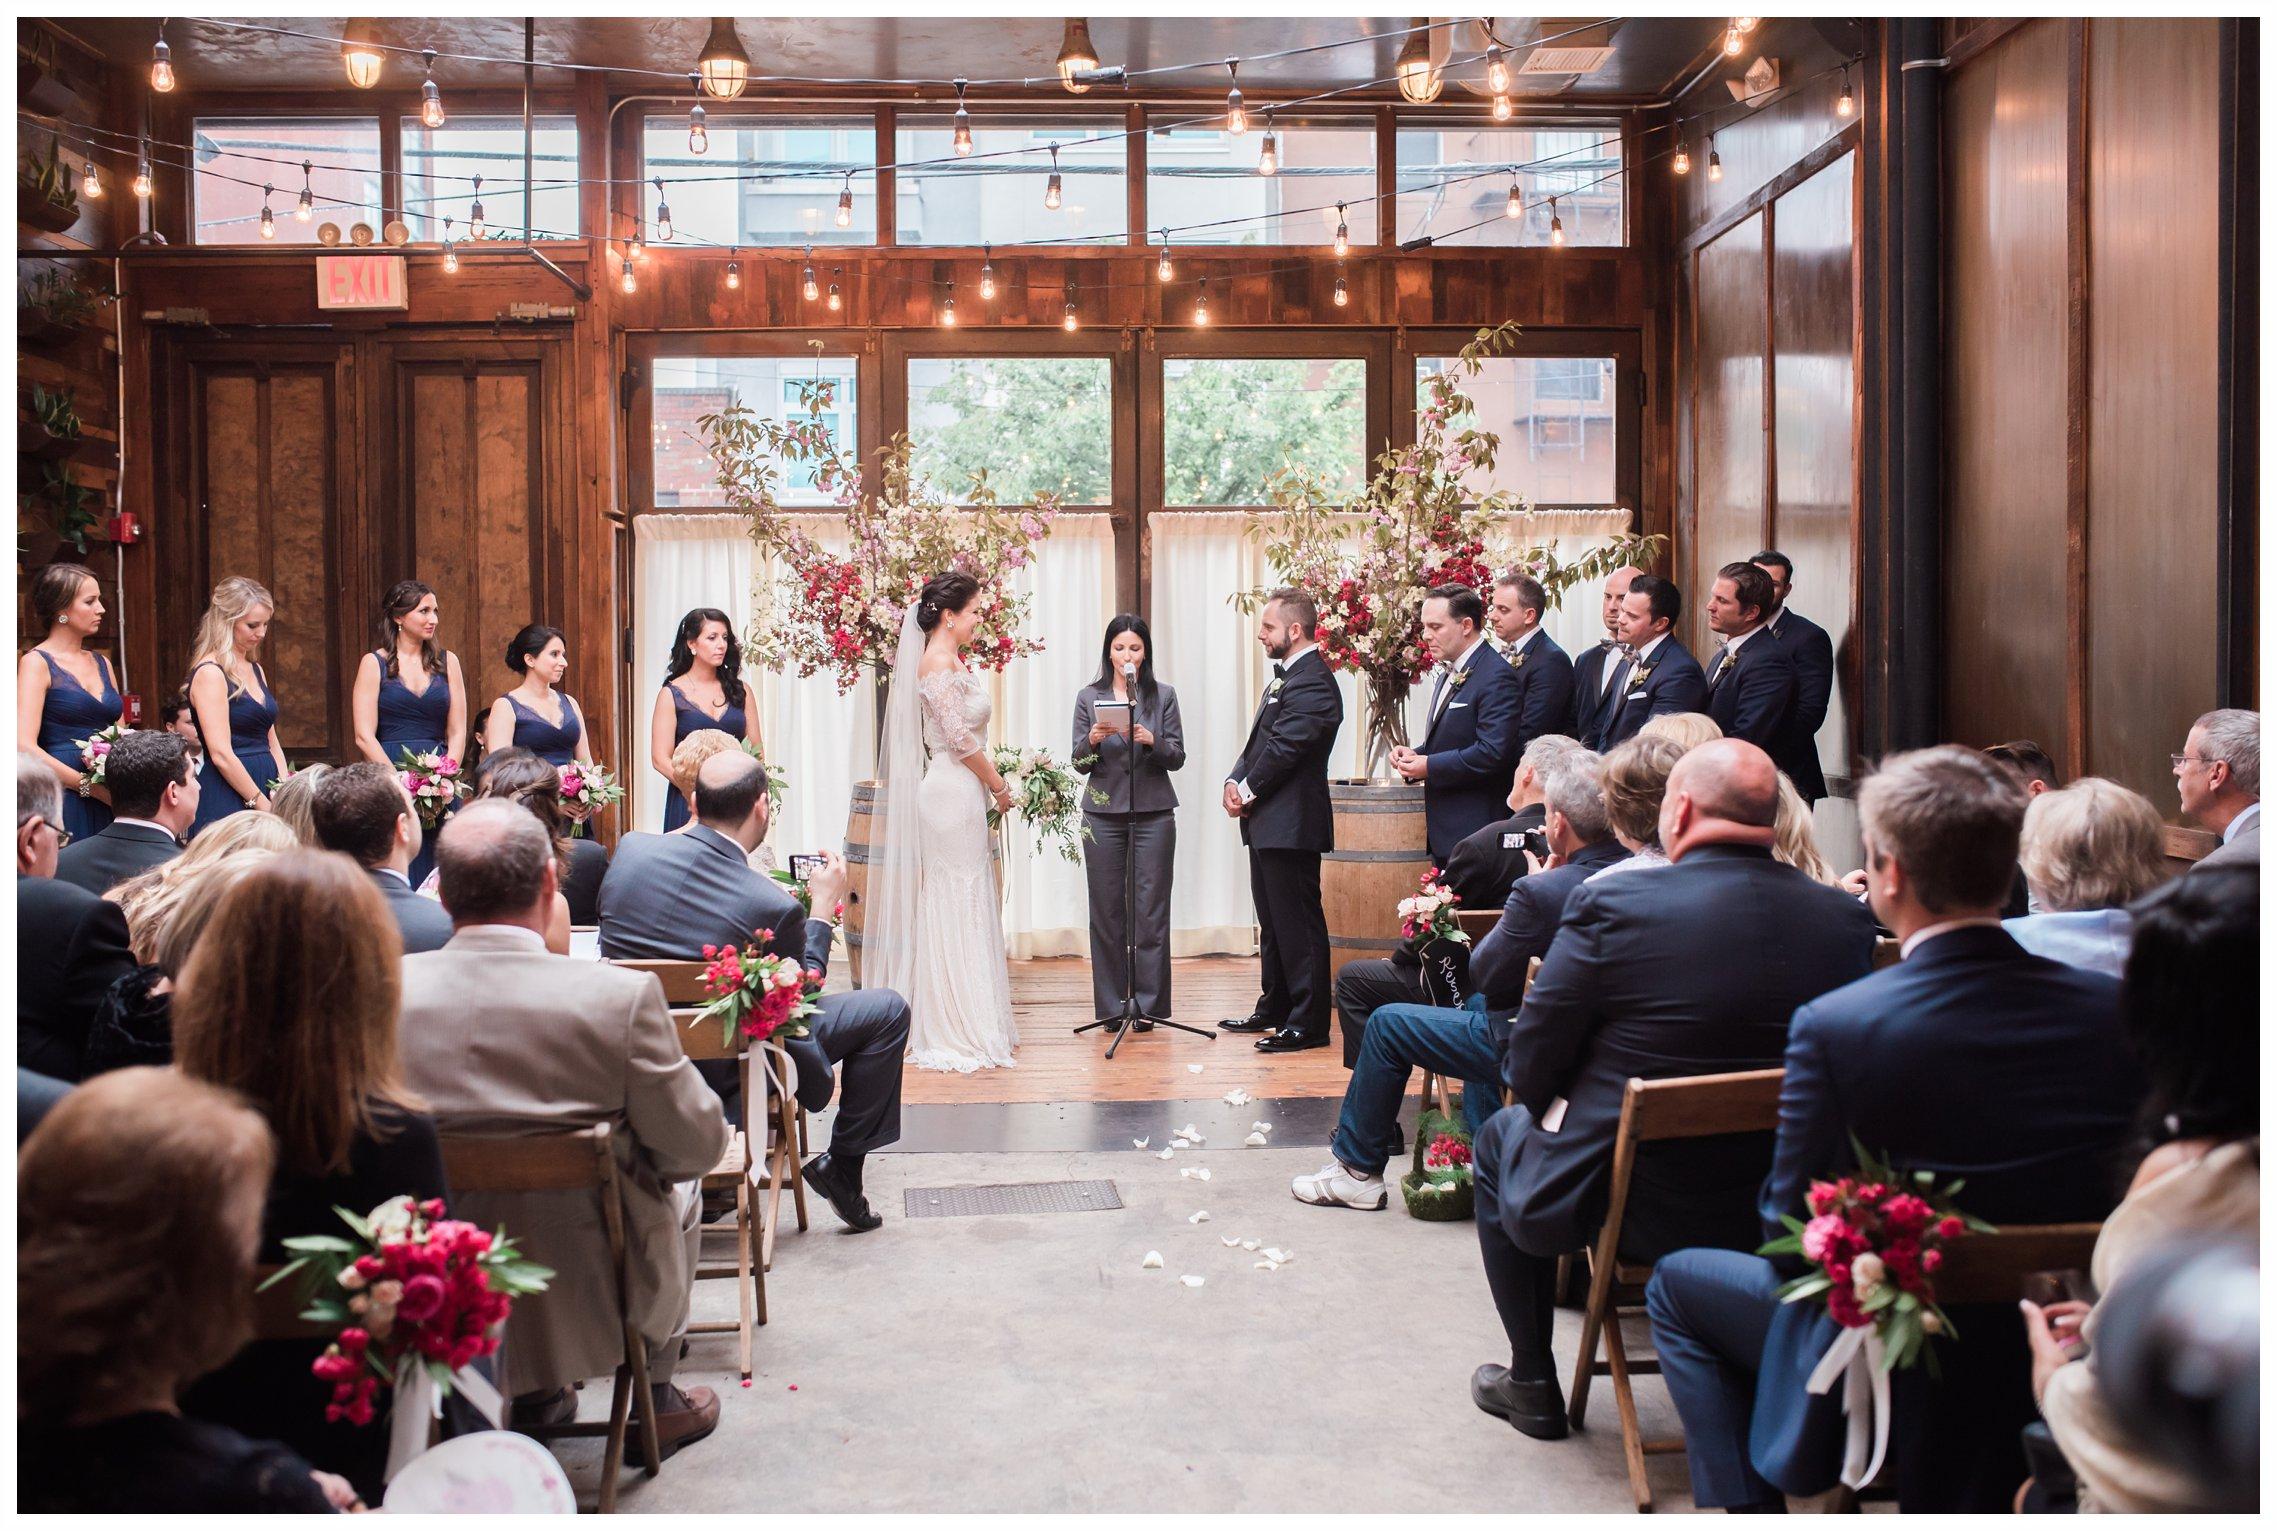 Wedding ceremony bride and groom wedding party at brooklyn winery williamsburg New York